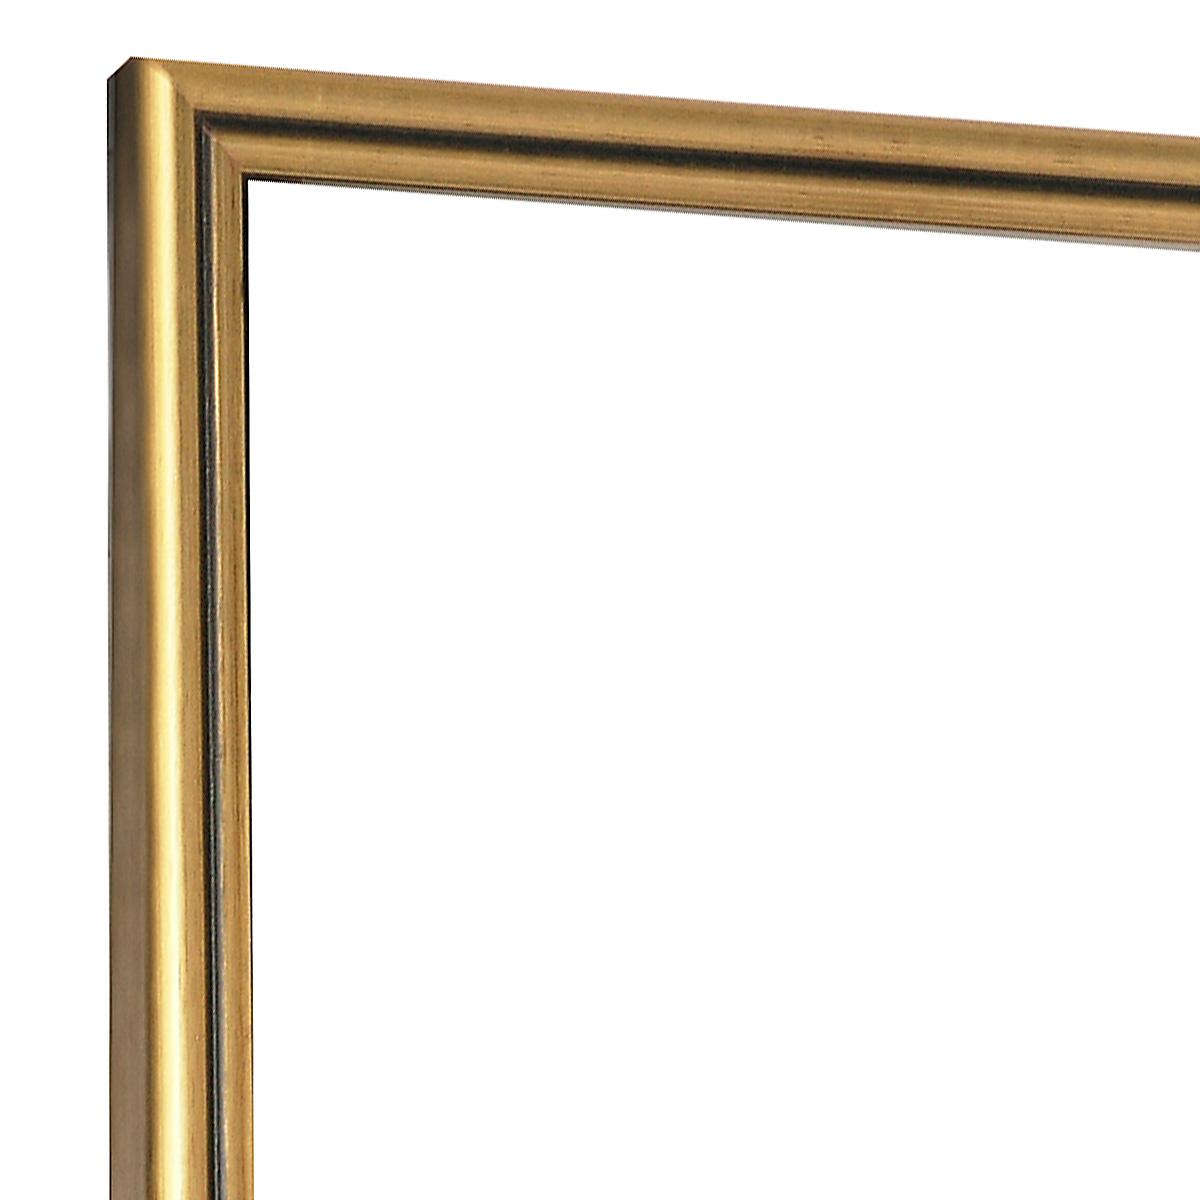 Moulding ayous 12mm - gold